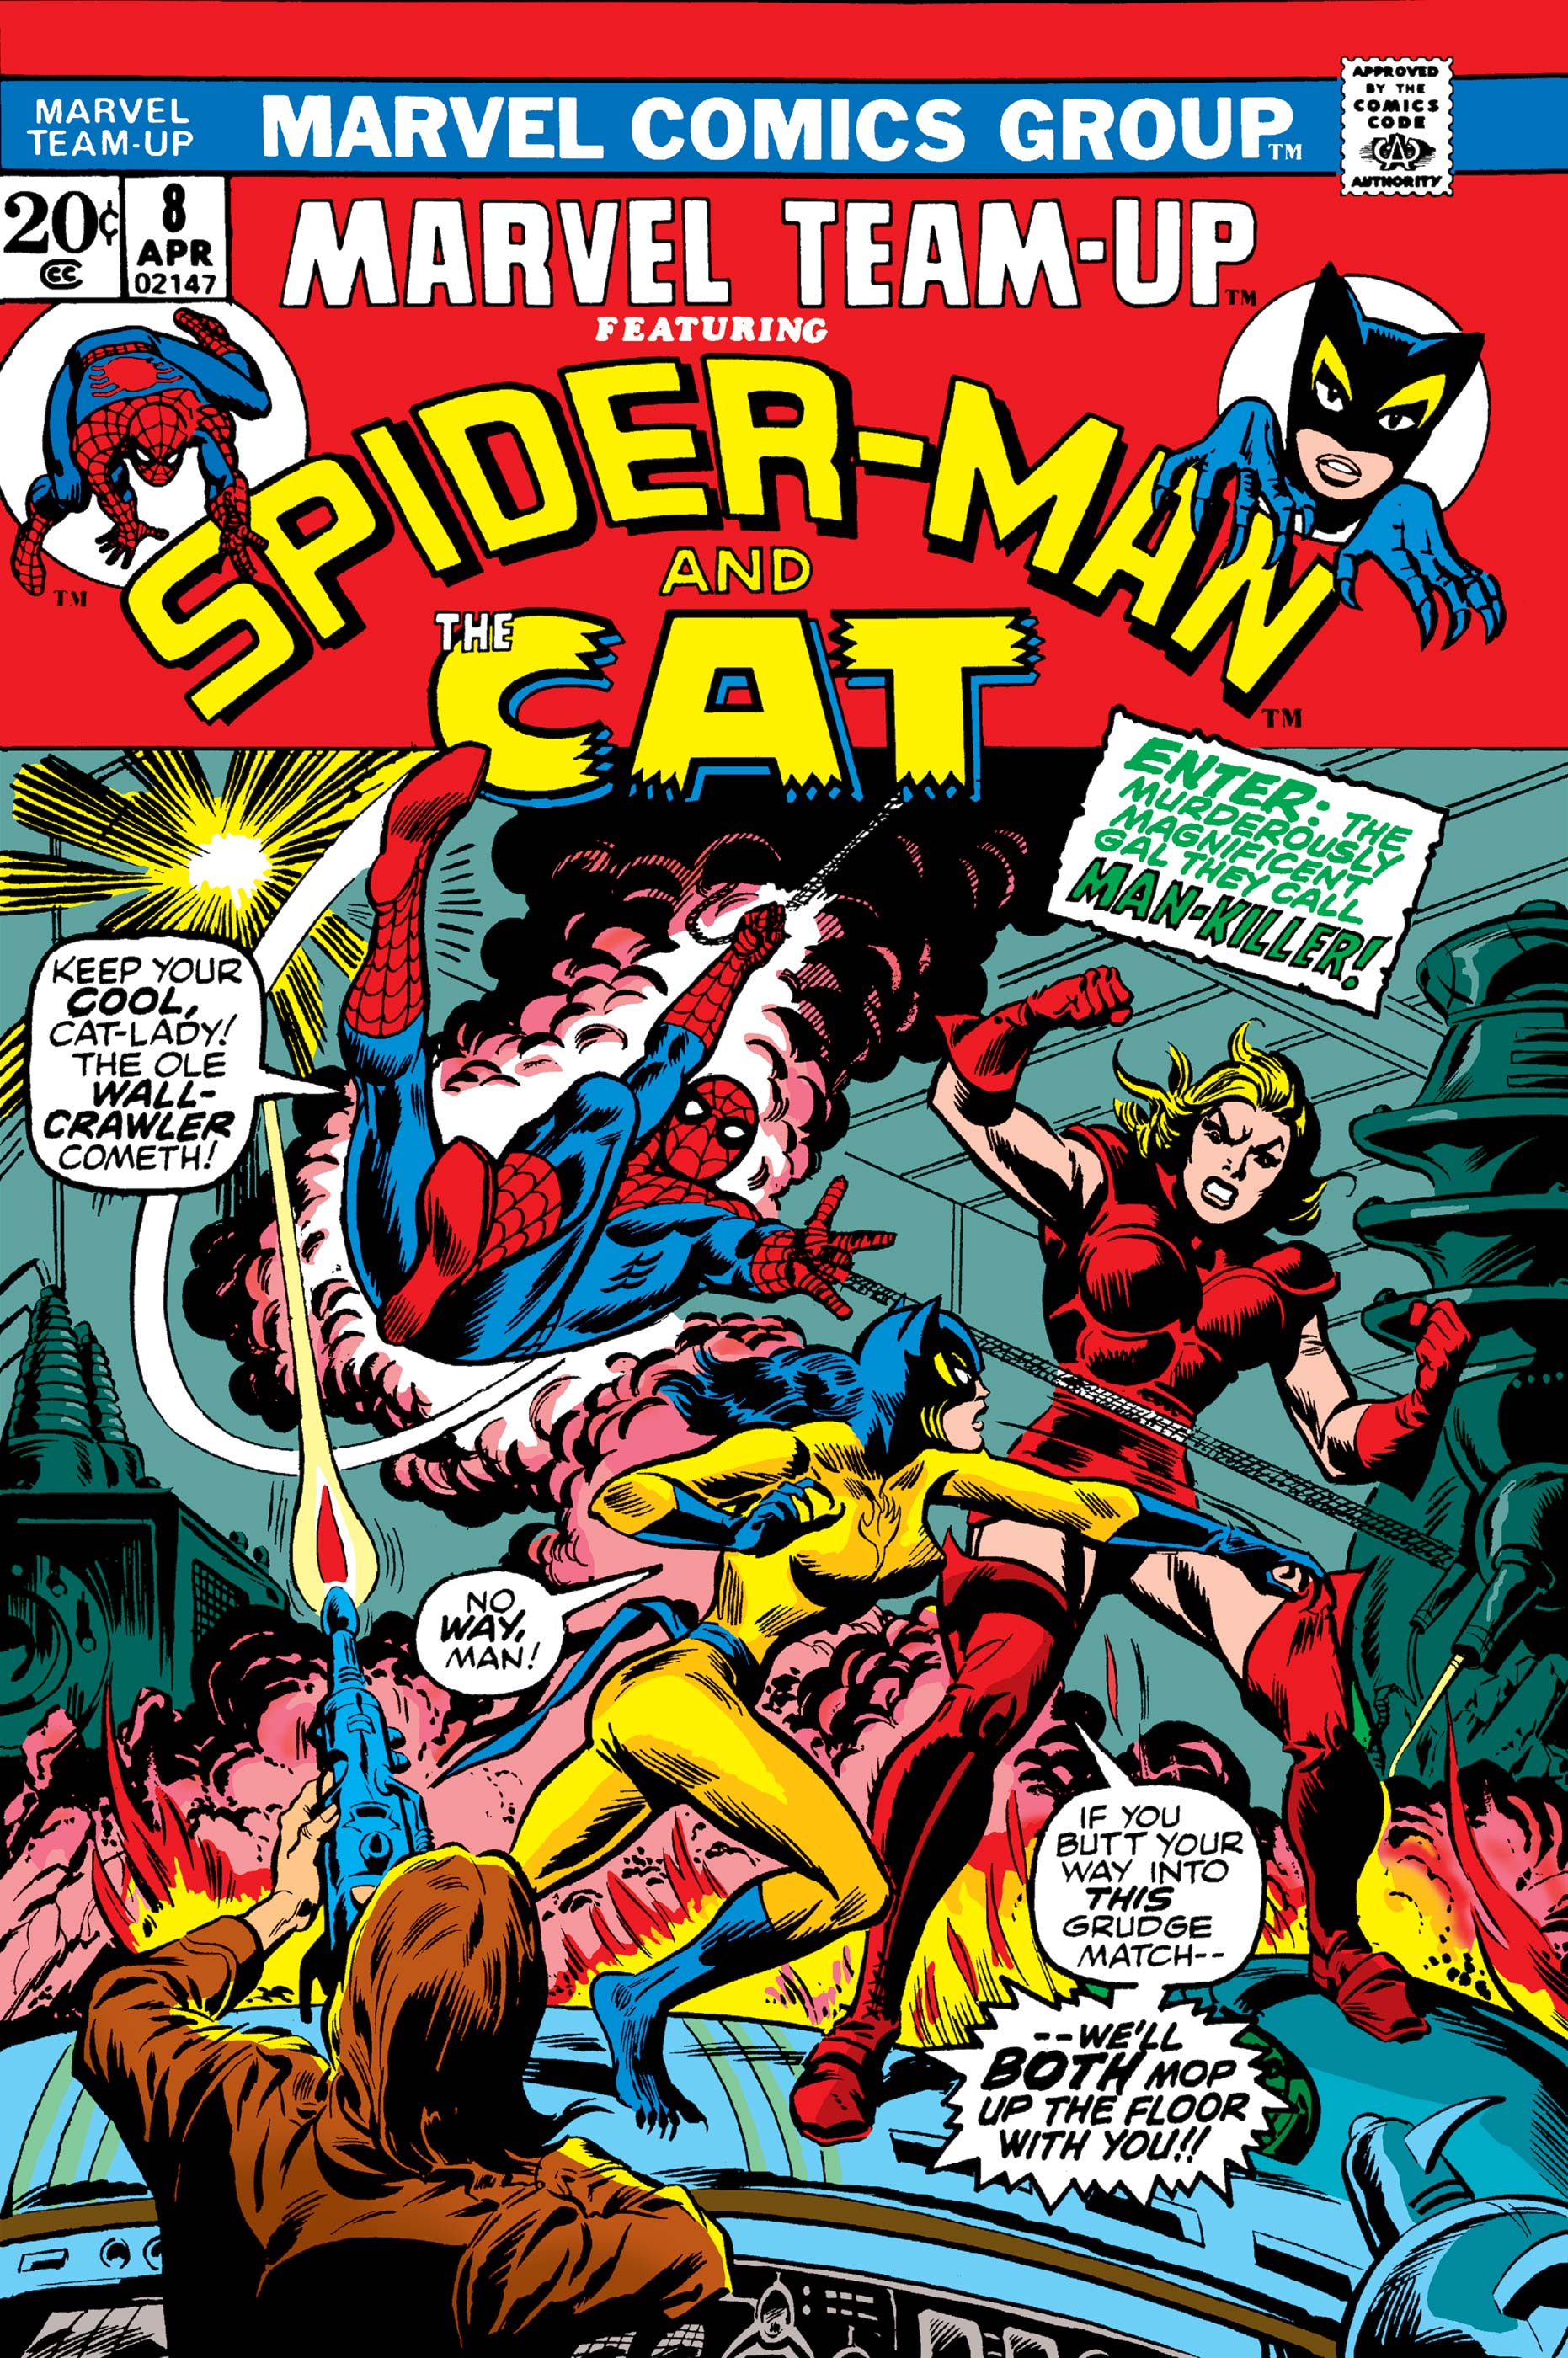 Marvel Team-Up (1972) #8